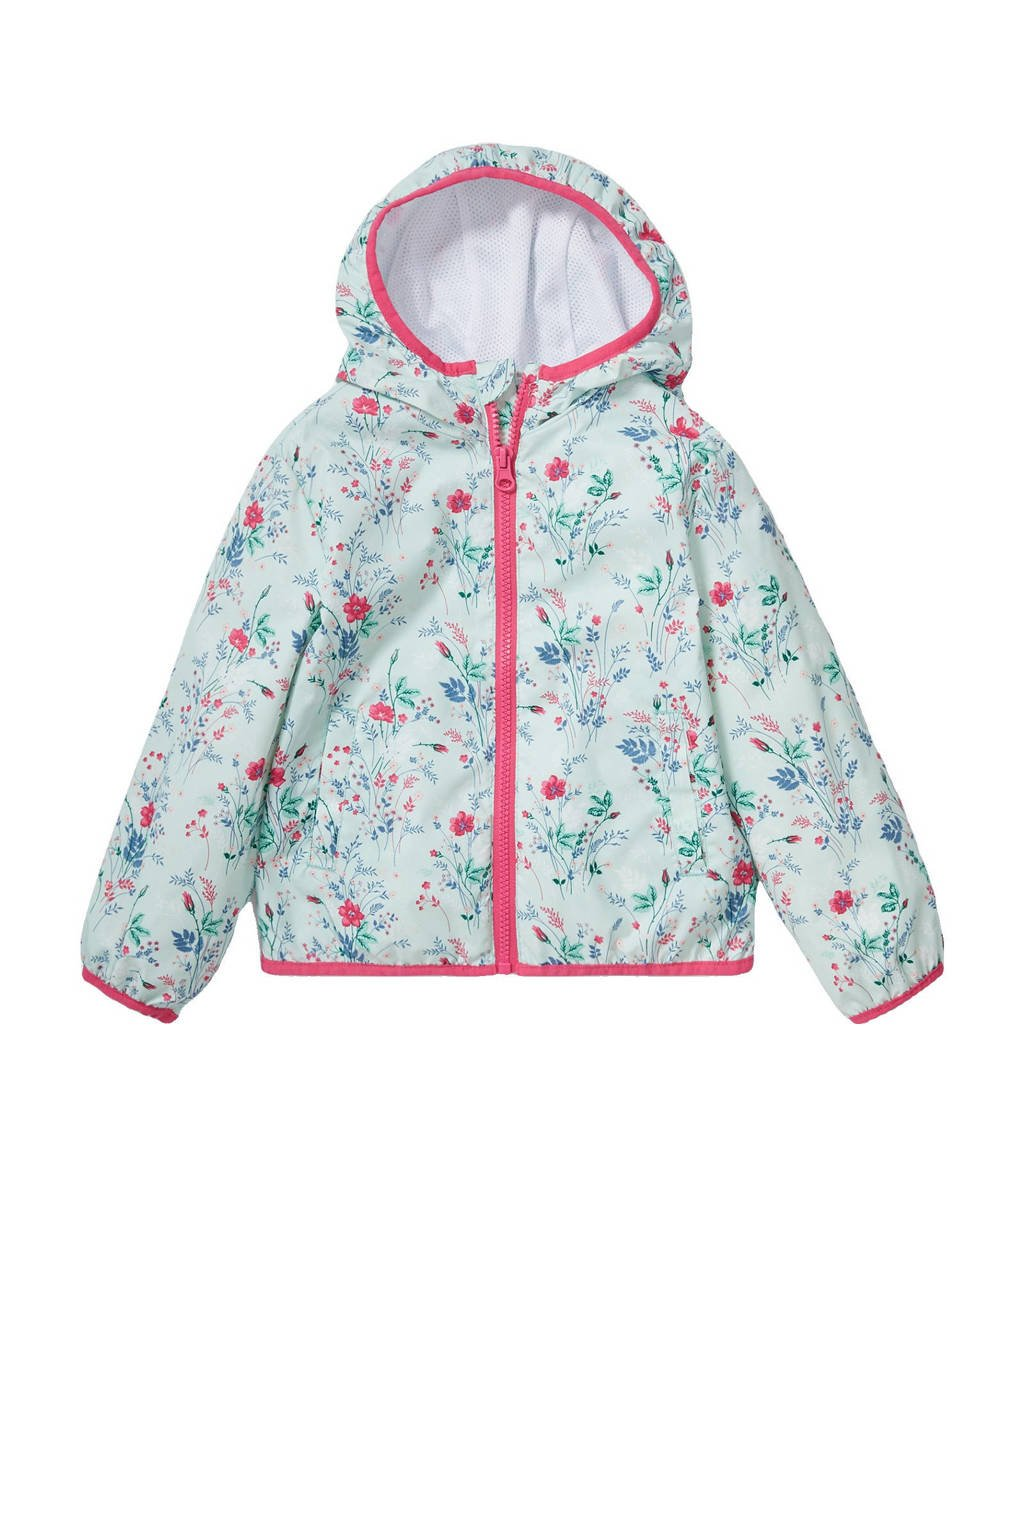 C&A Palomino  zomerjas met all over print mintgroen/roze, Mintgroen/roze